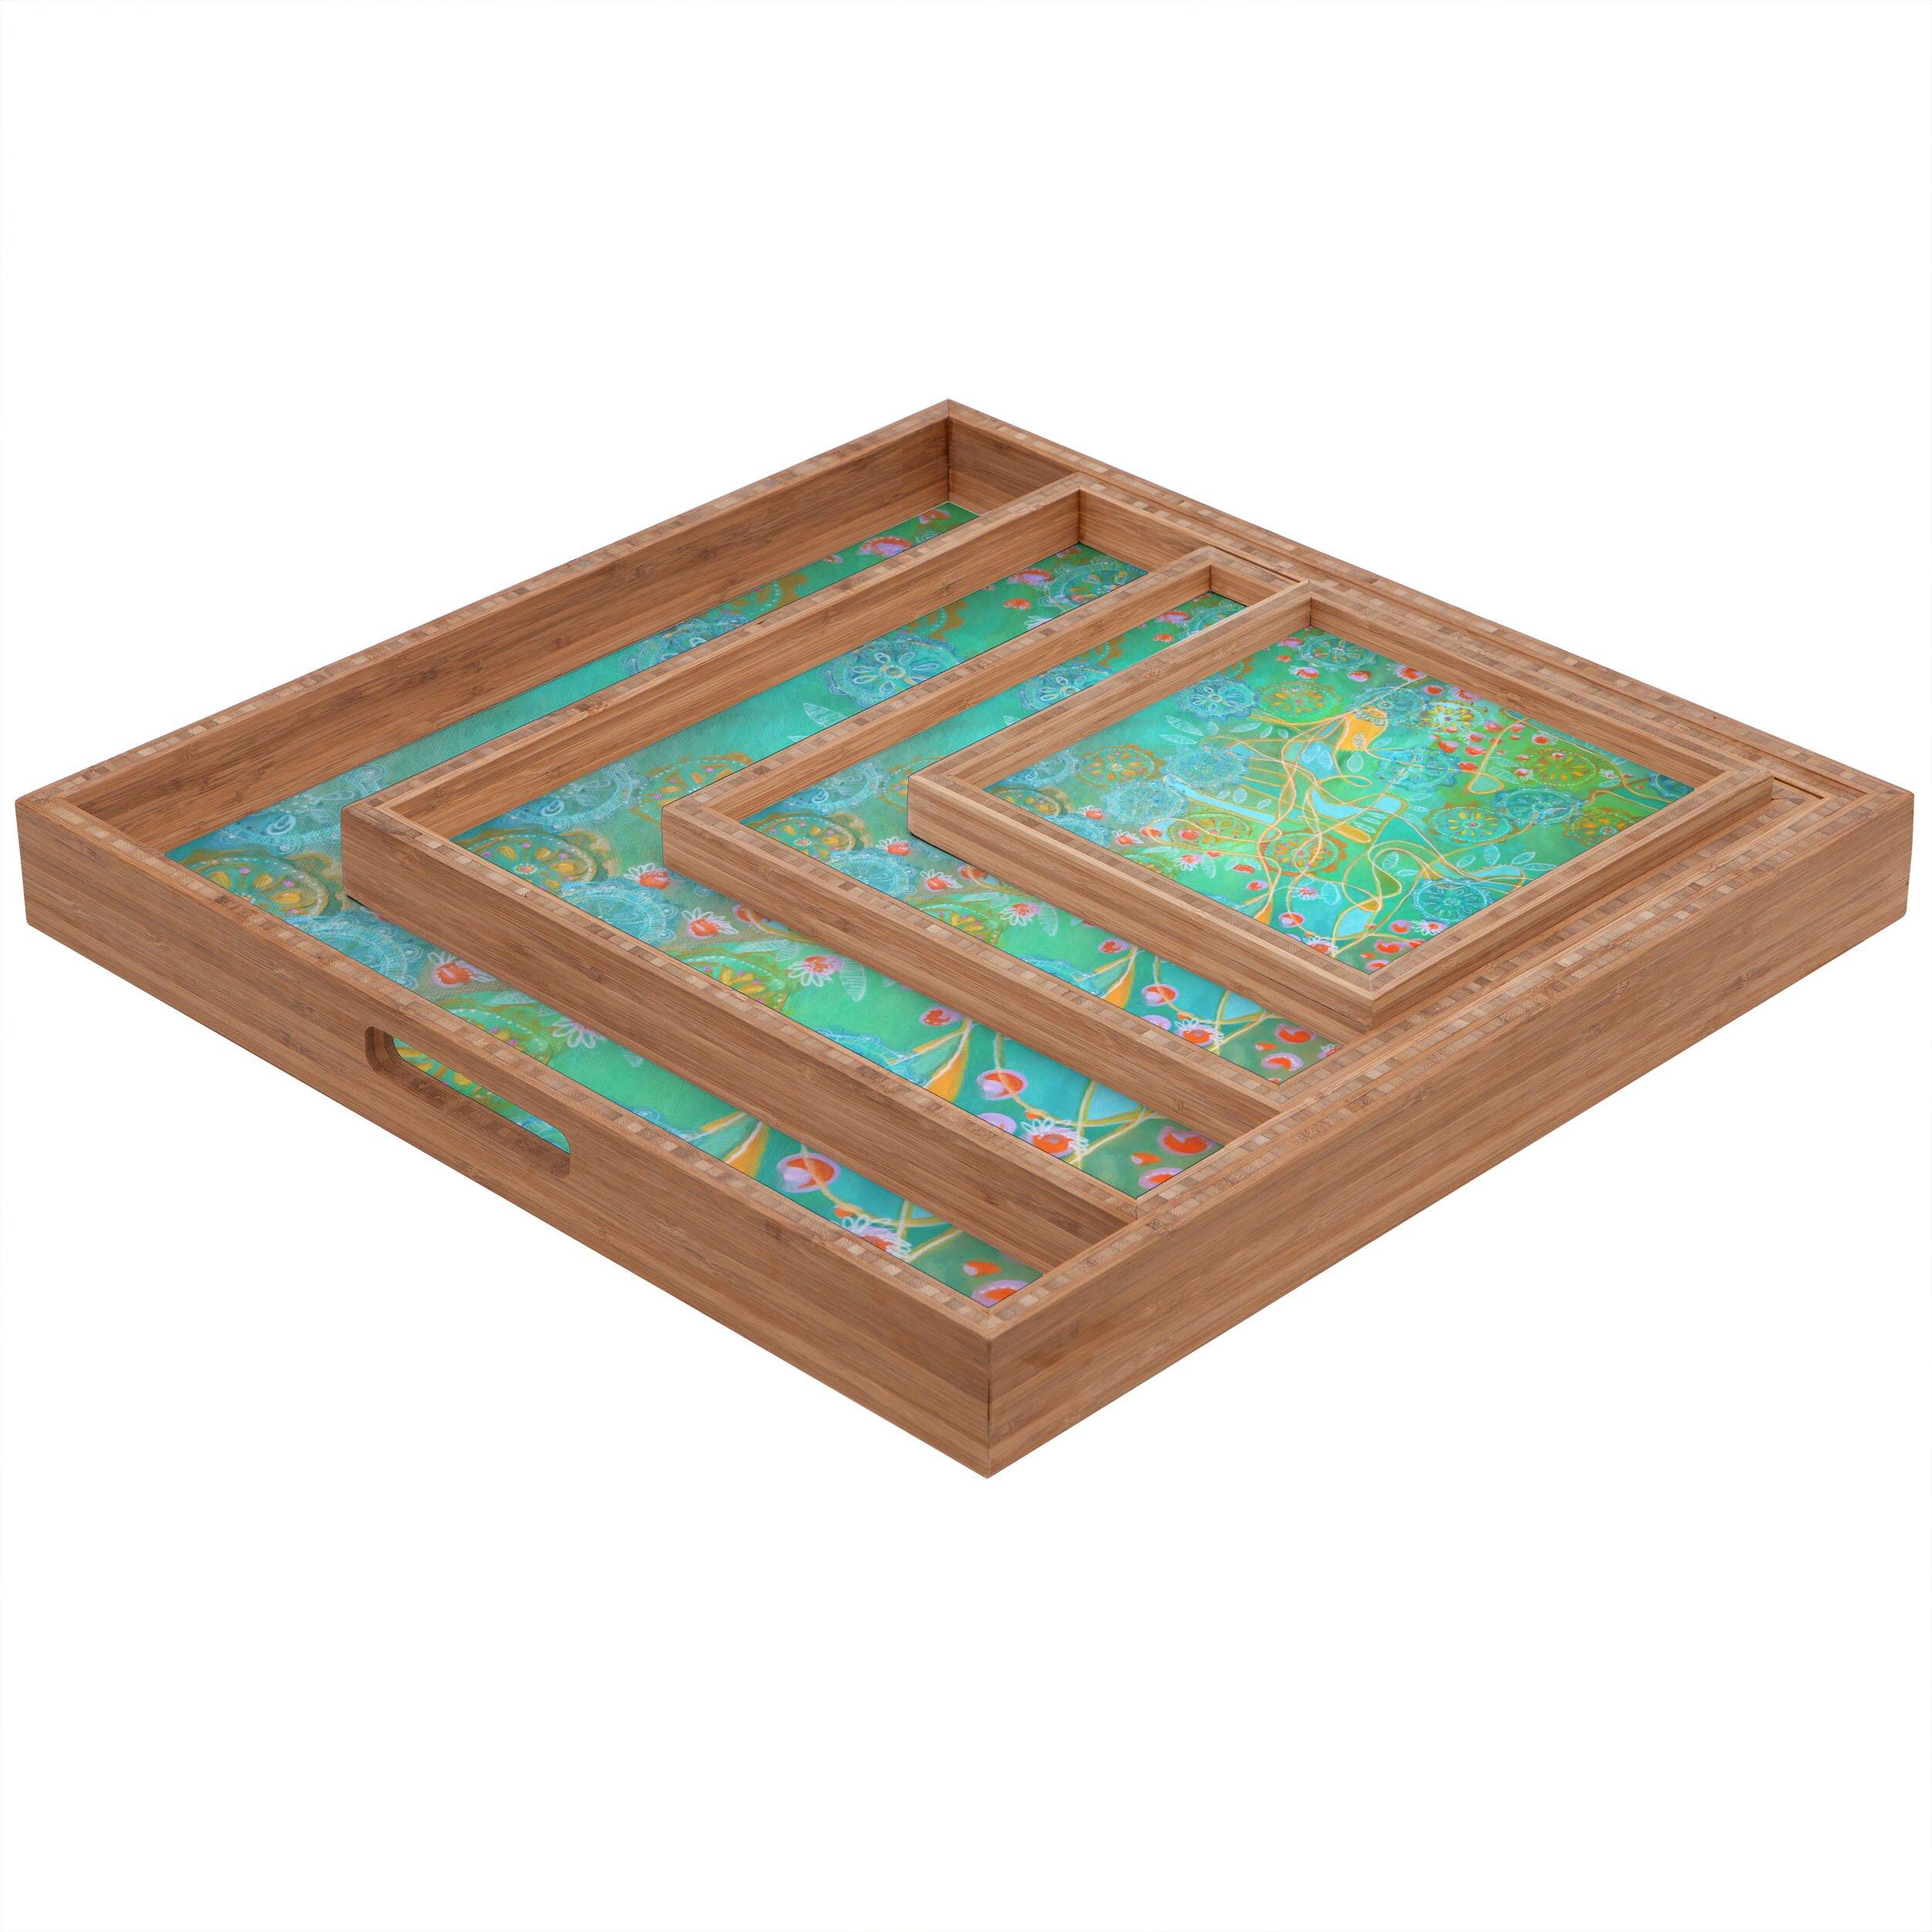 Deny designs stephanie corfee secret garden square tray for Tray garden designs